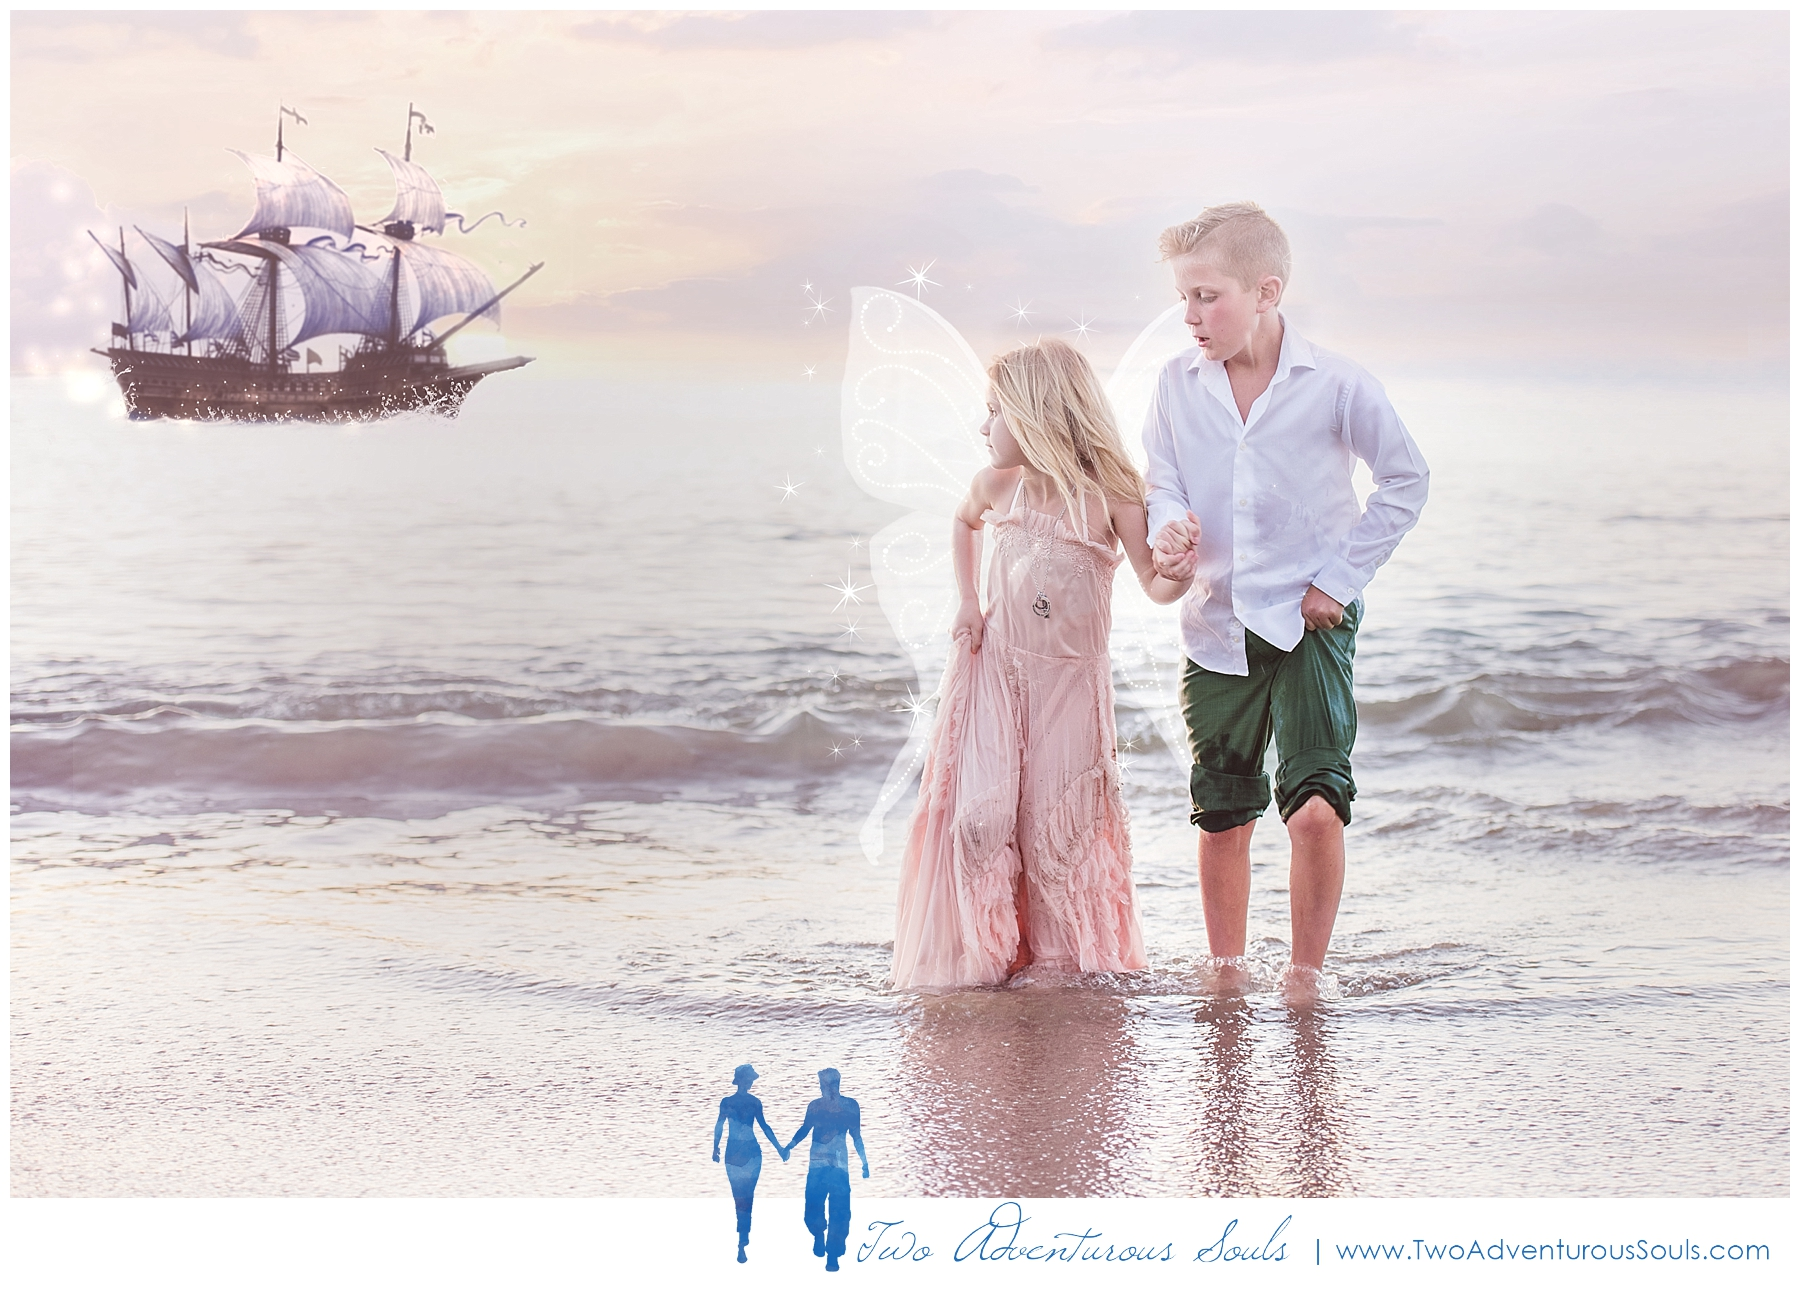 Dreams-Las-Mareas-Wedding-Costa-Rica-Wedding-Photographers-Two-Adventurous-Souls_0055.jpg